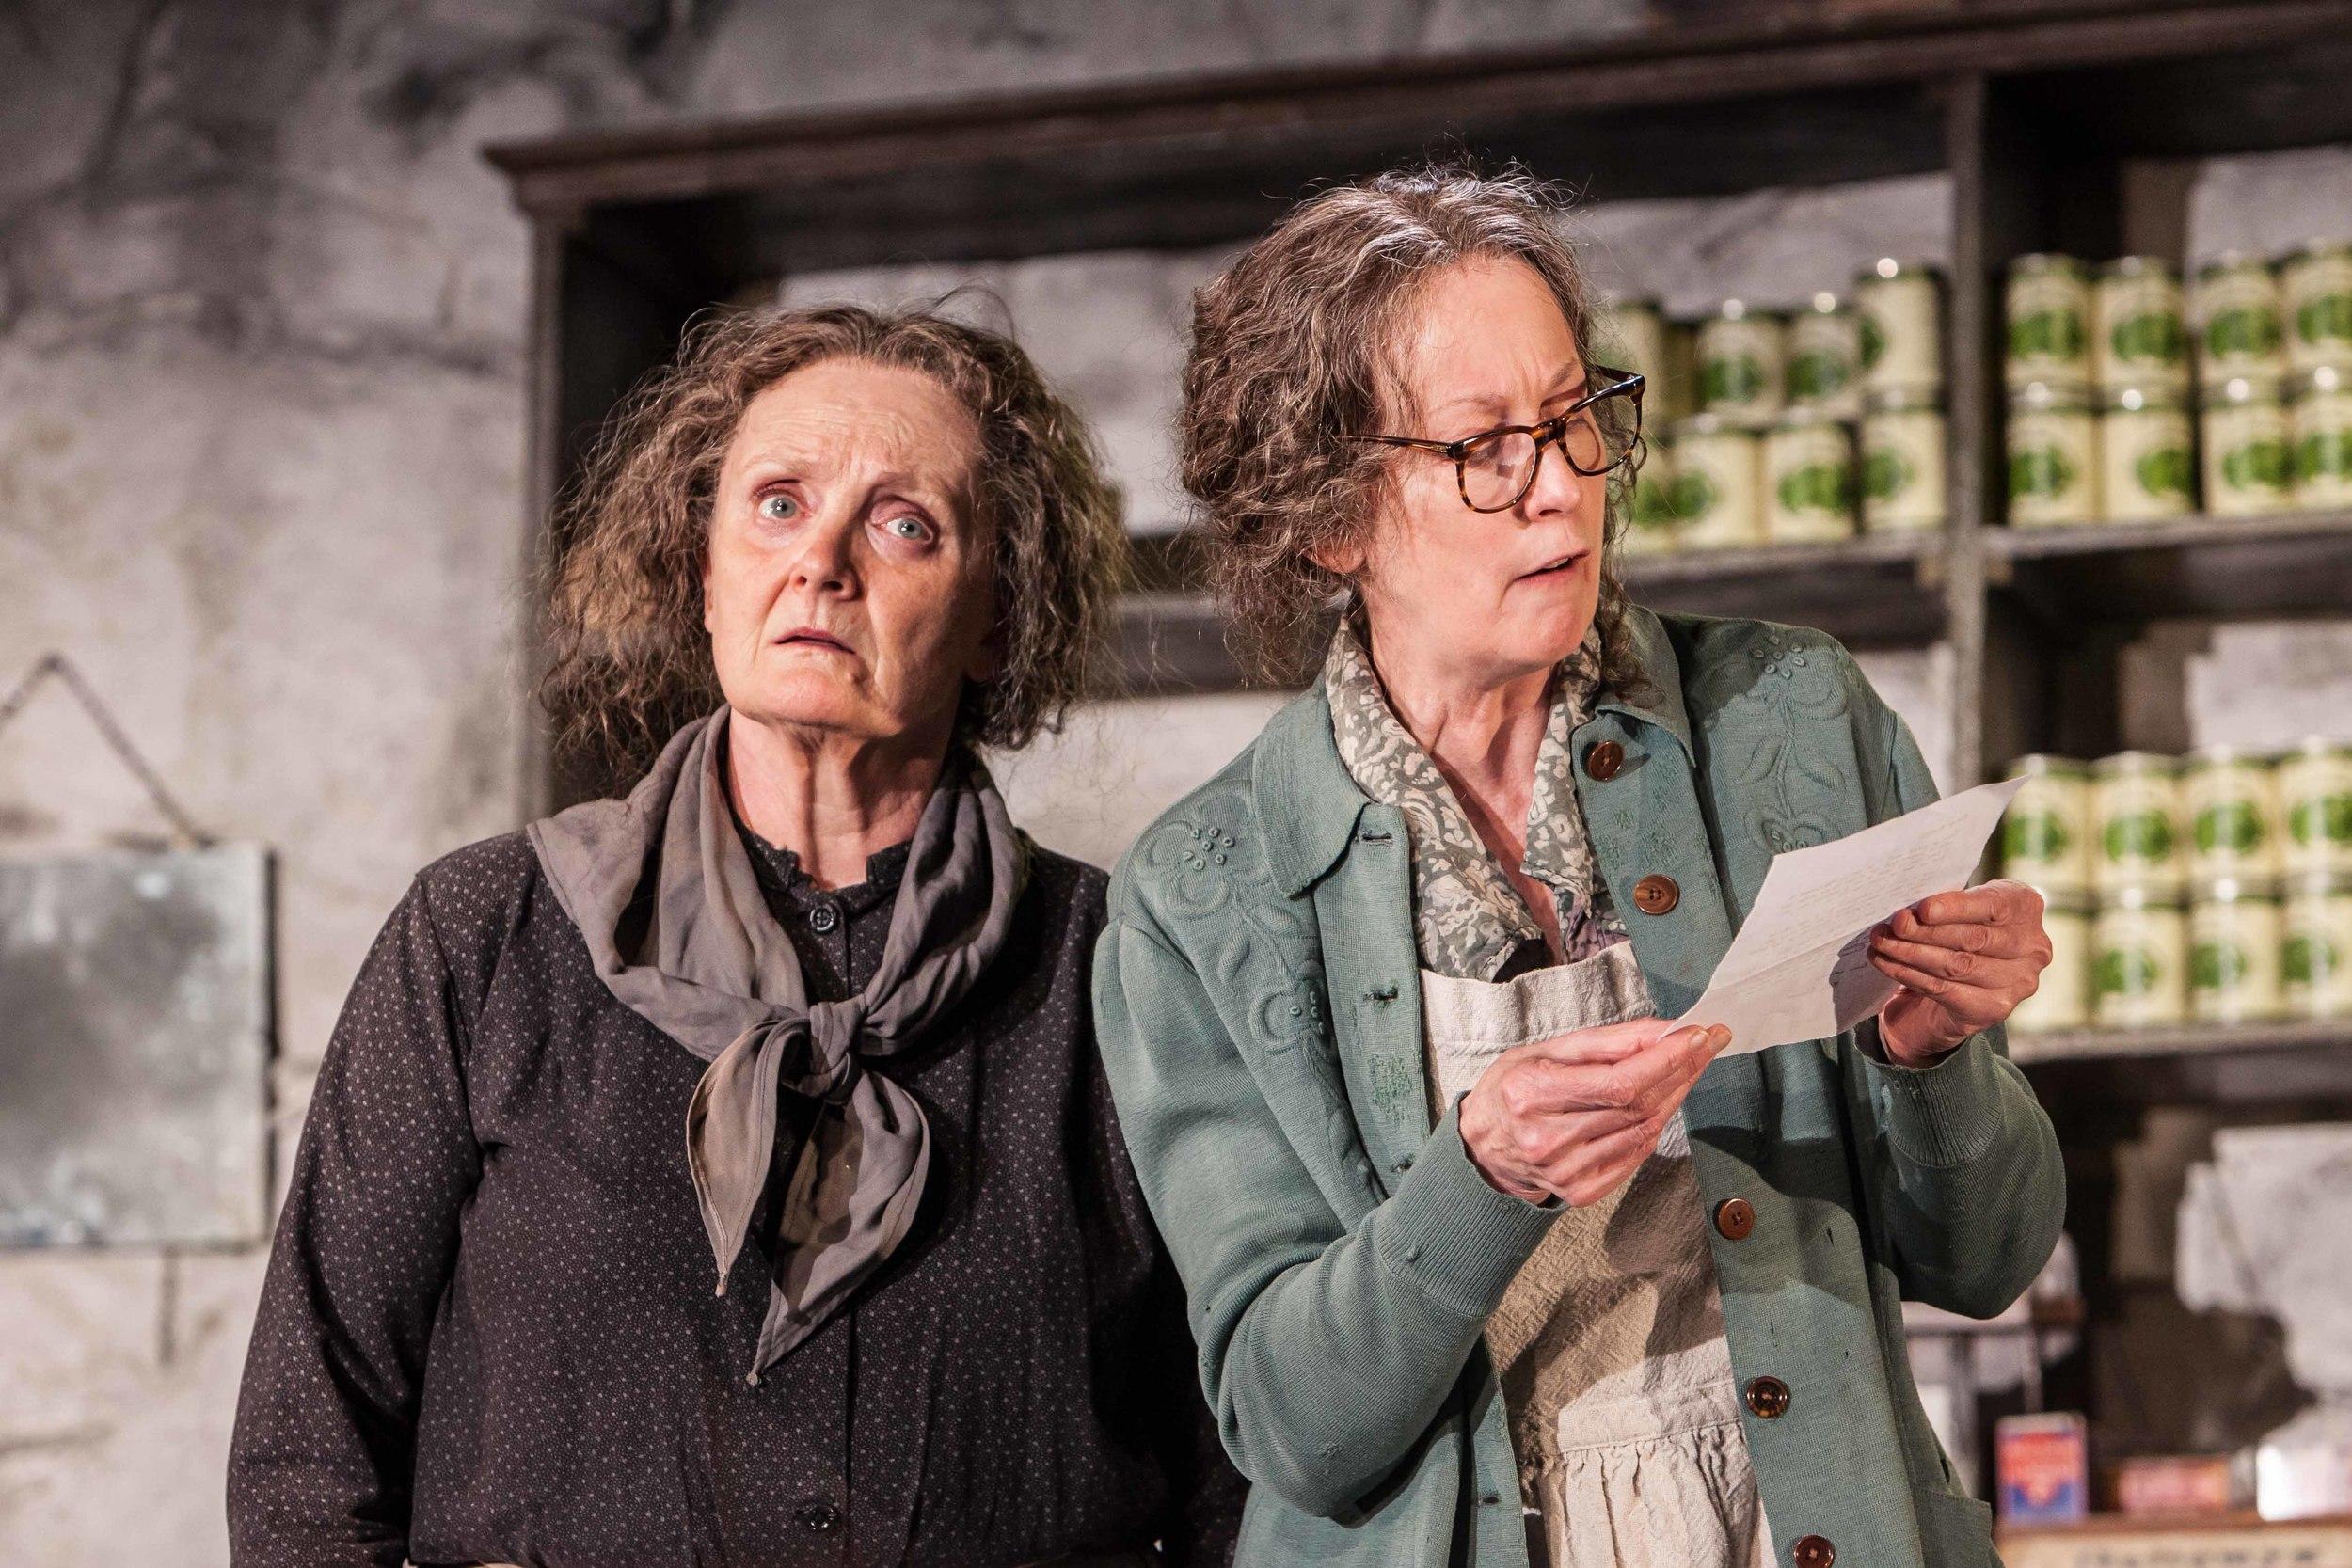 The Cripple of Inishmaan • Noel Coward Theatre and Broadway • Dir. Michael Grandage